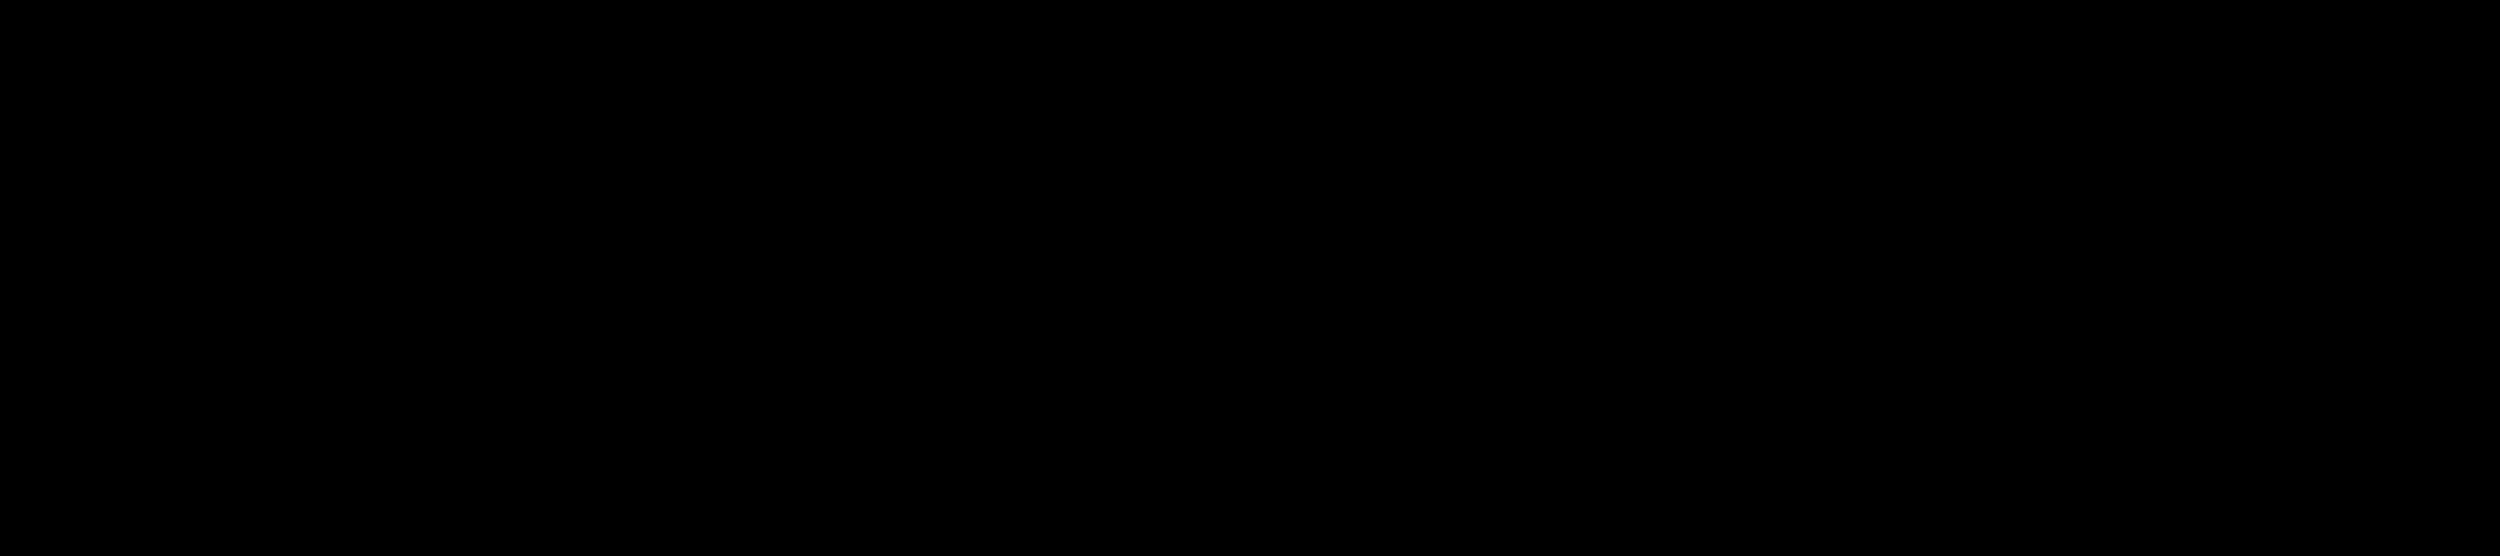 HH-Logo-BW.png